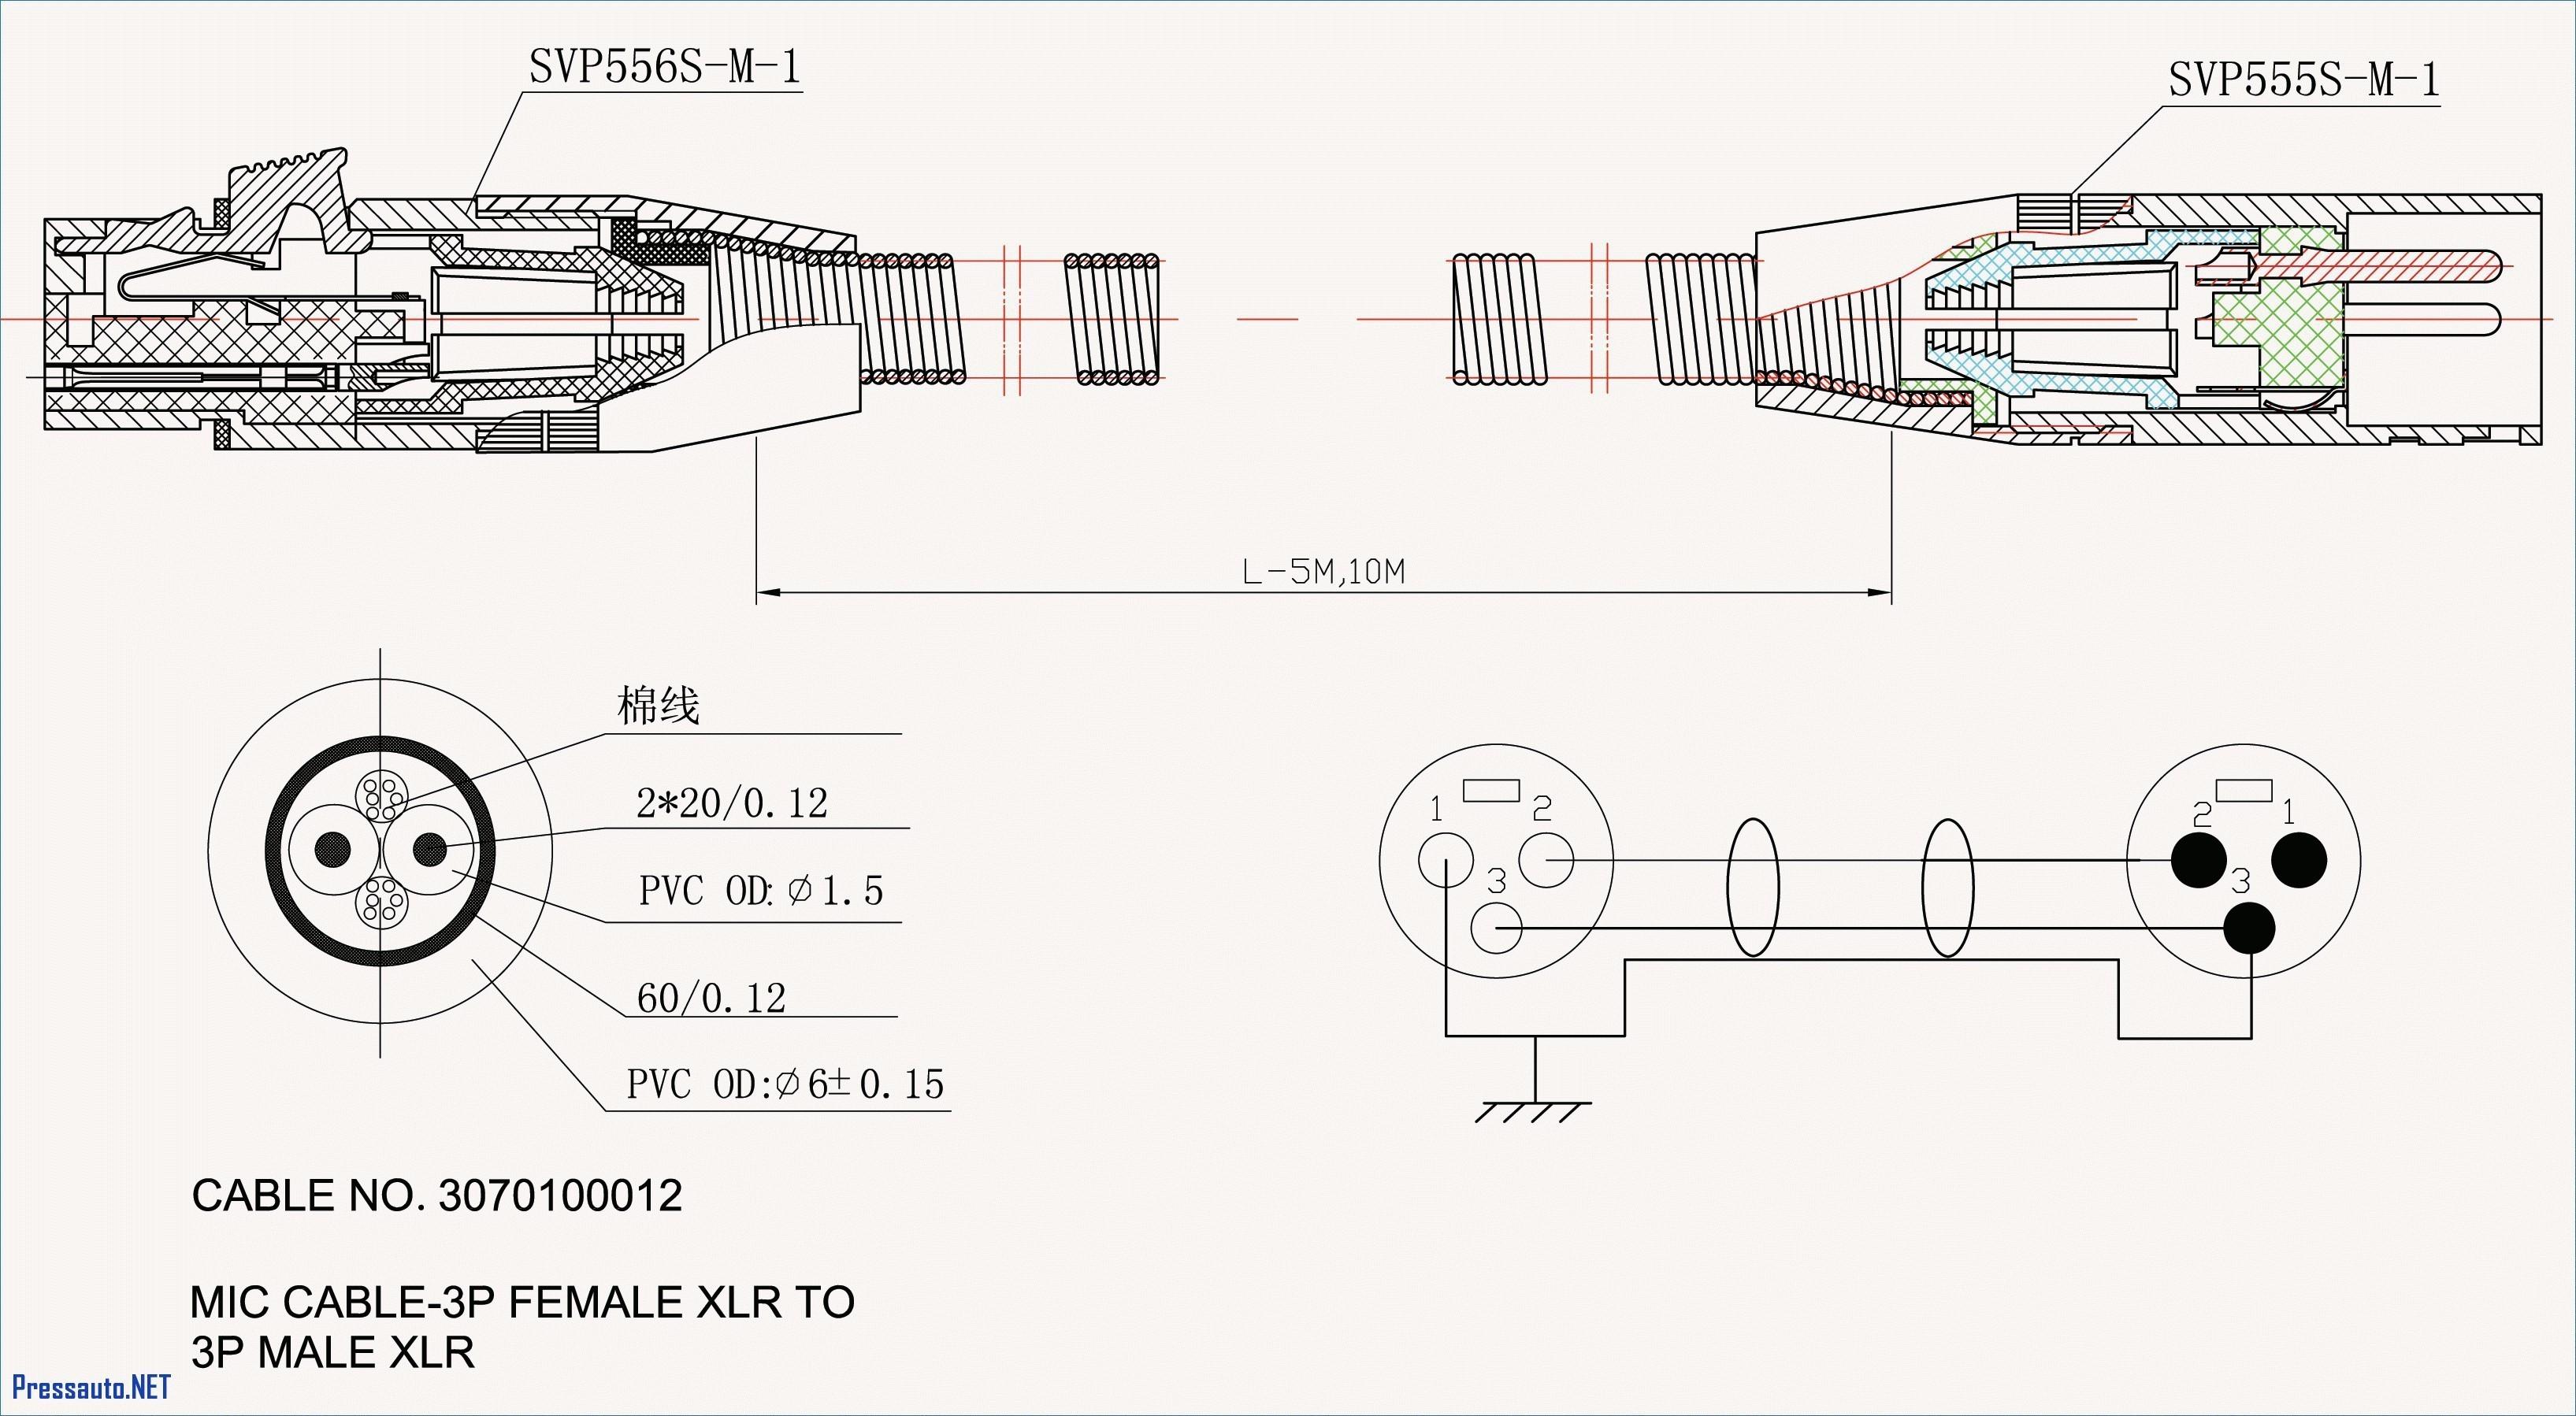 One Wire Alternator Diagram Ac Delco Wiring Diagram Best ... Ac Delco One Wire Alternator Wiring Diagram on